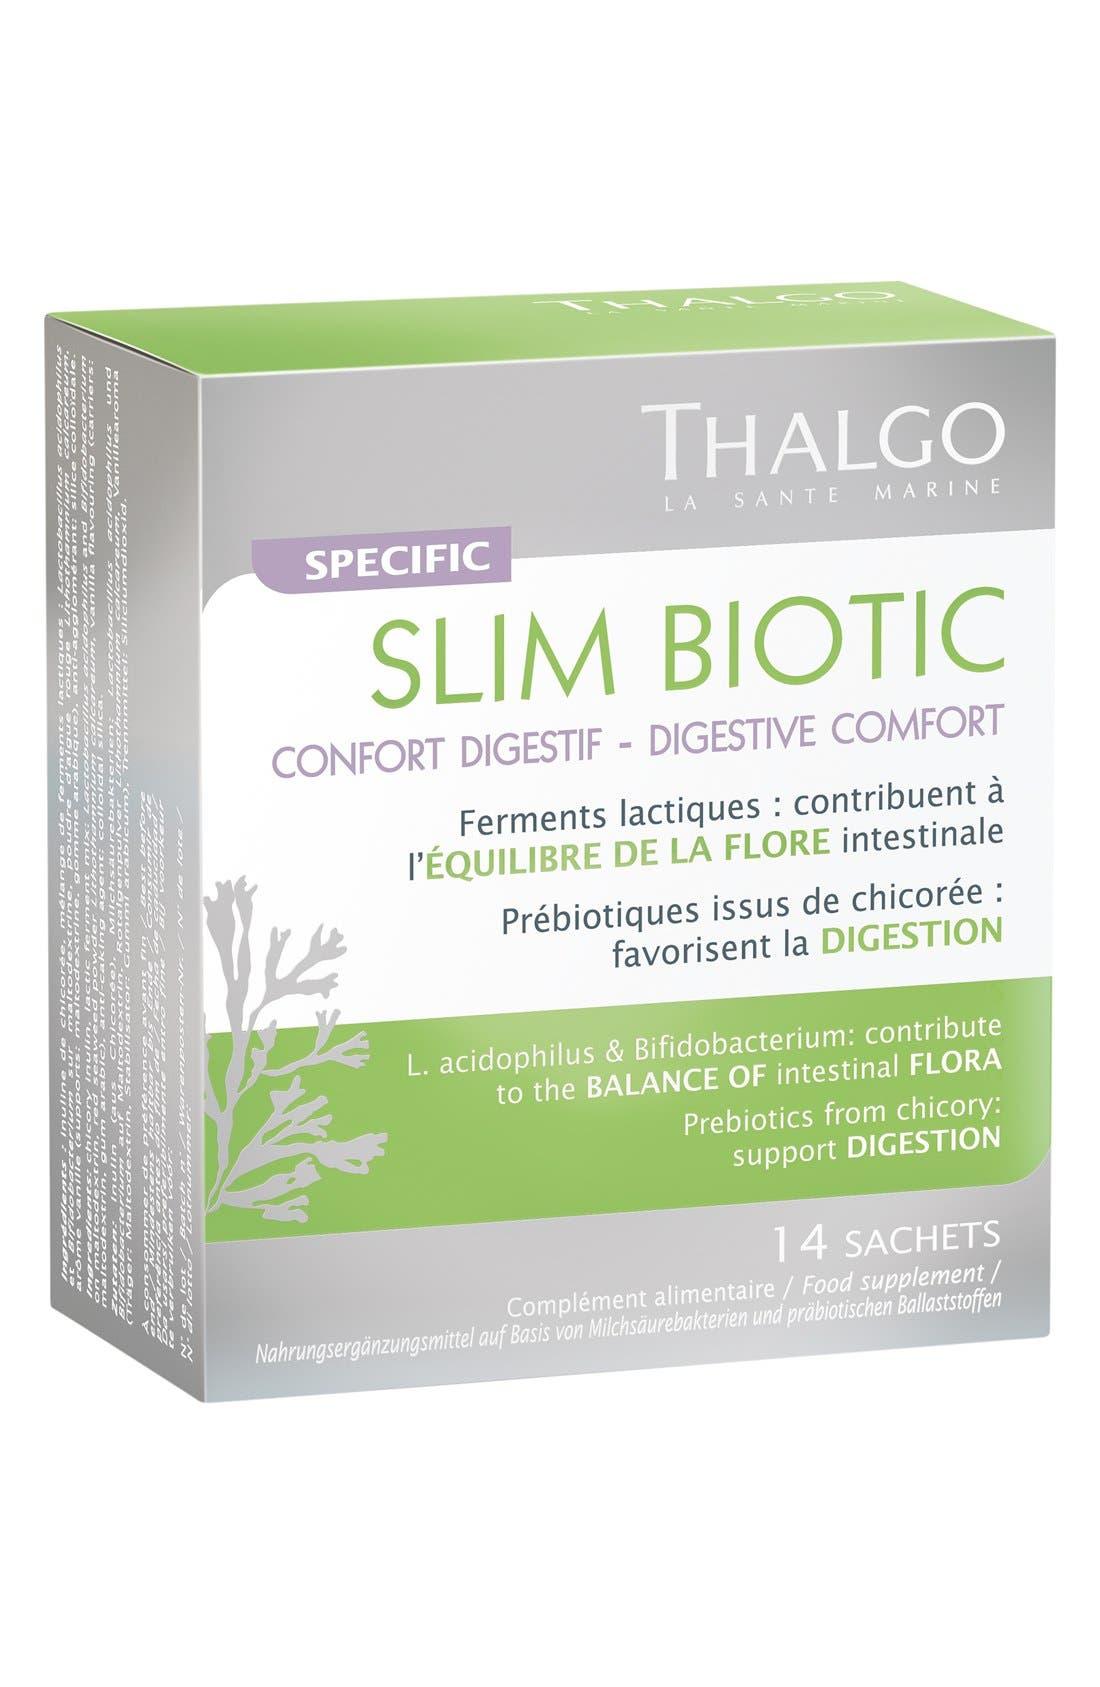 Alternate Image 1 Selected - Thalgo 'Slim Biotic' Sachets